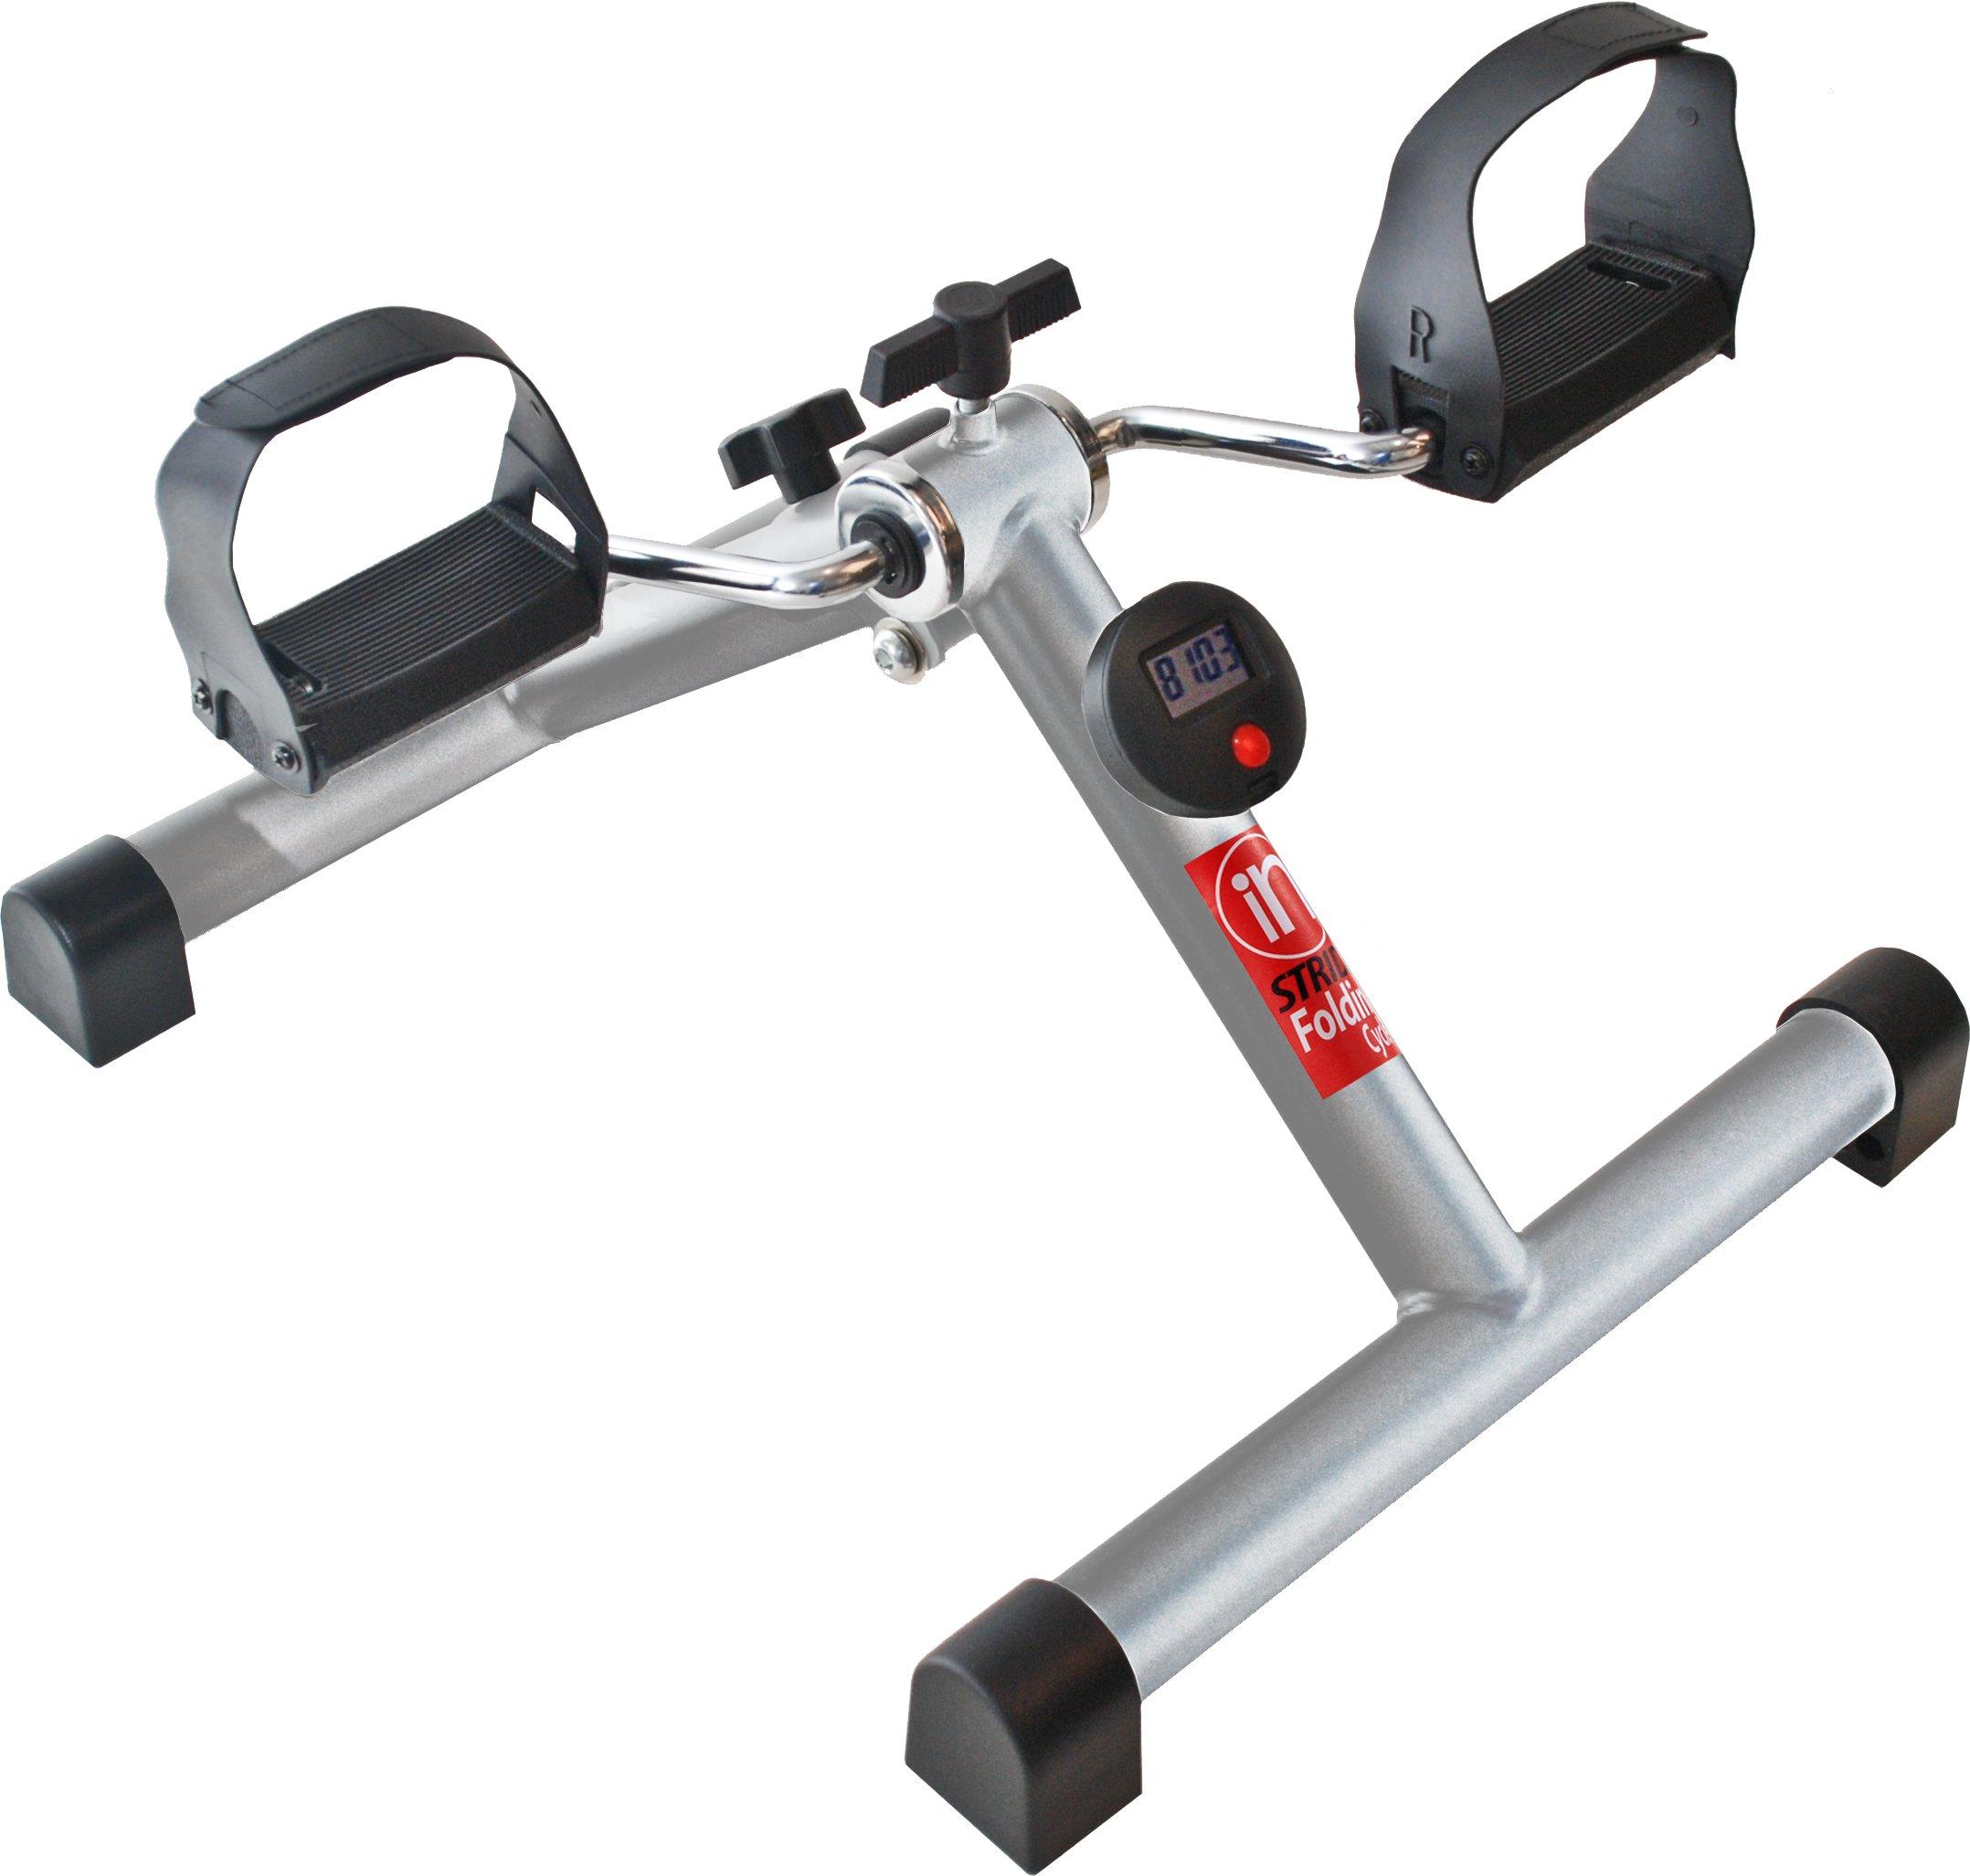 Stamina 15-0125 InStride Folding Cycle